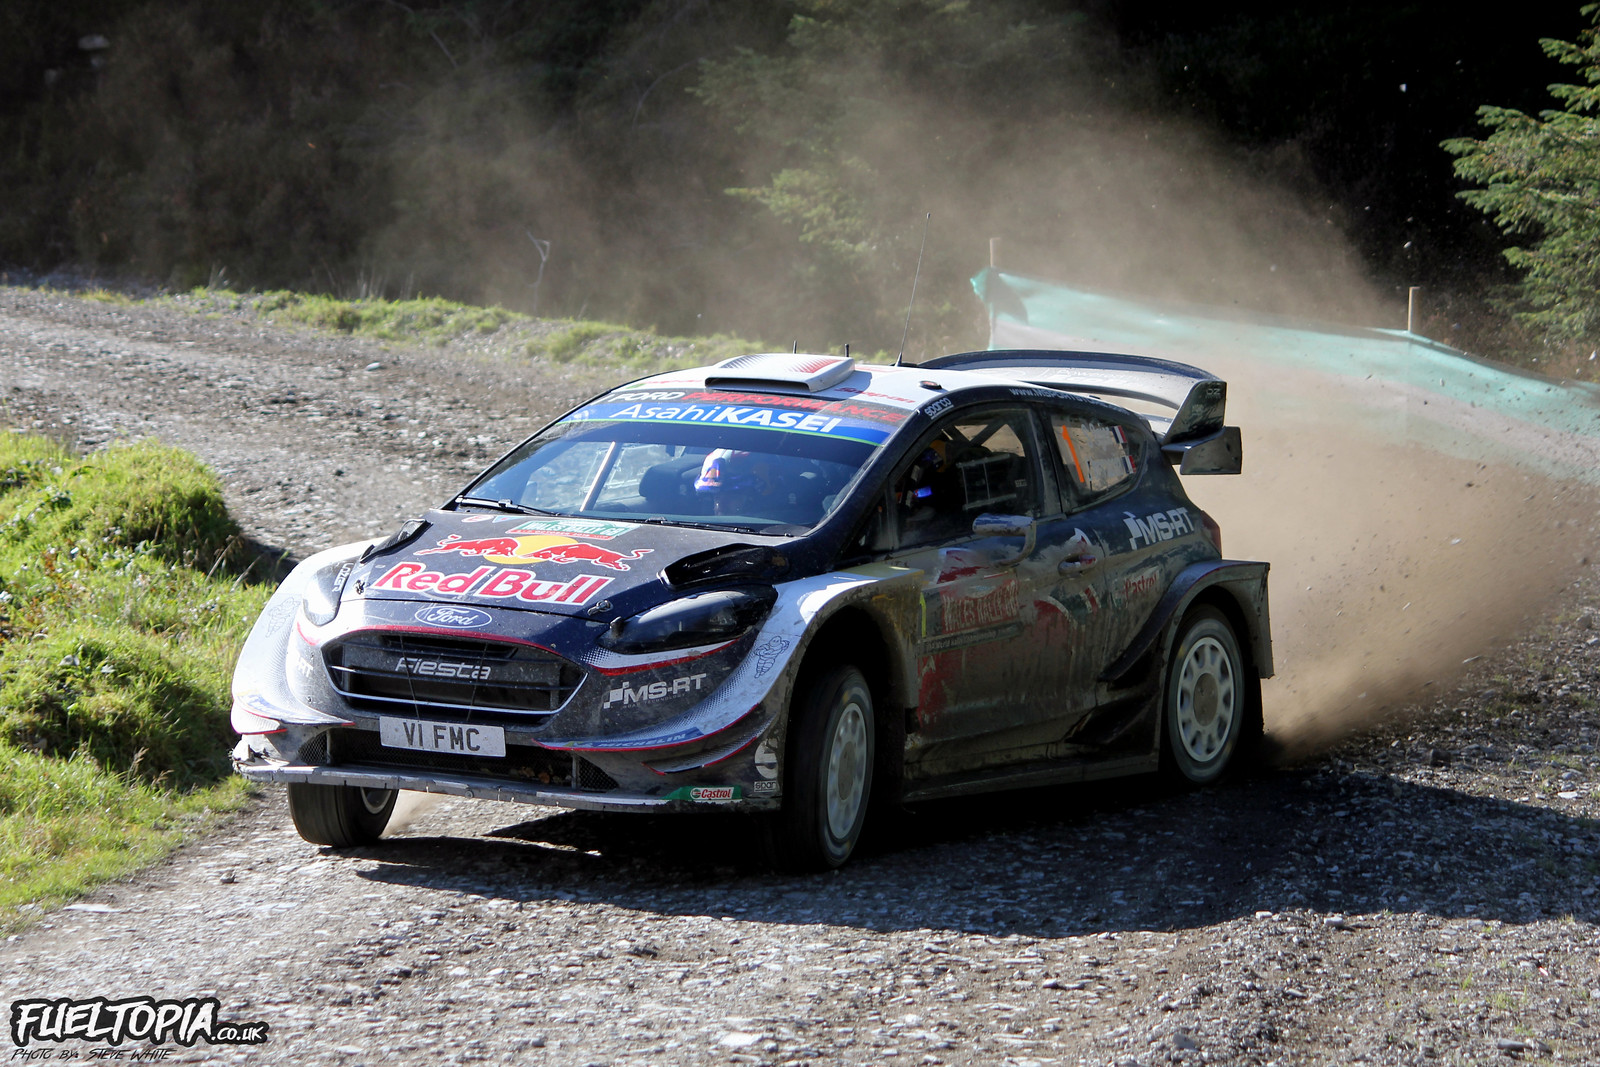 Sebastien Ogier Ford Fiesta M-Sport Rally GB 2018 WRC World Rally Championship